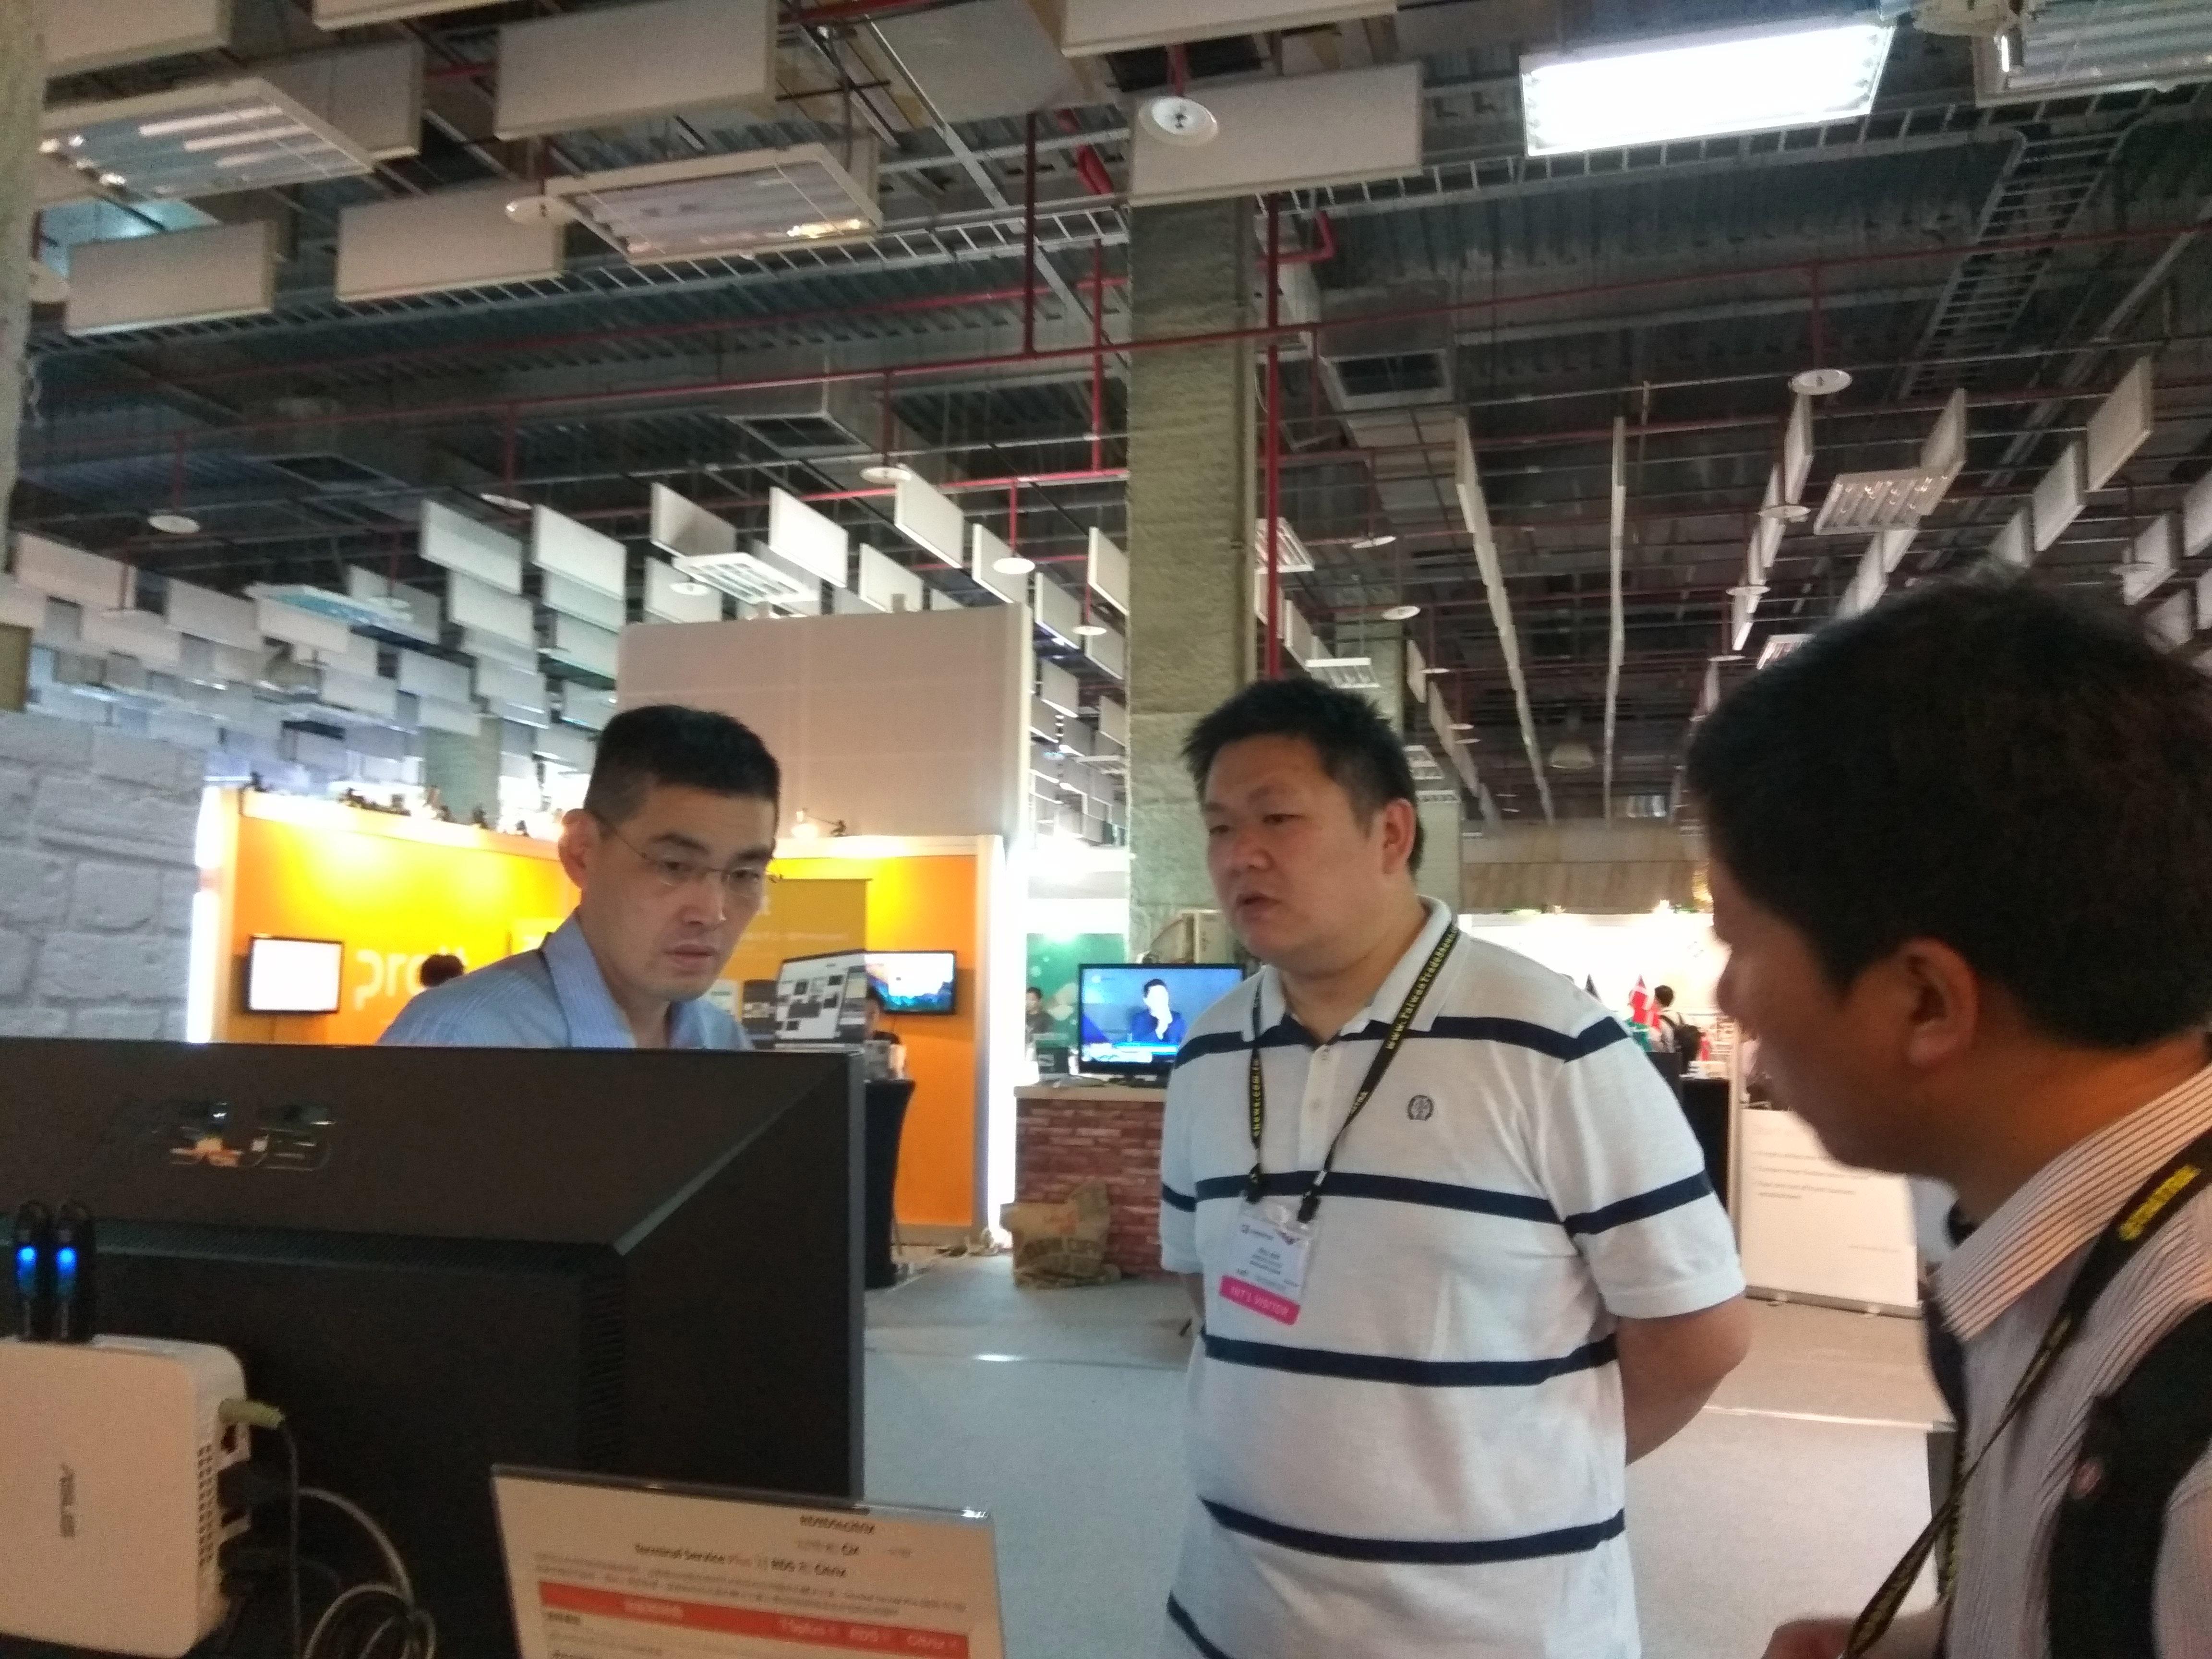 中國THINCLIENT客戶經銷合作